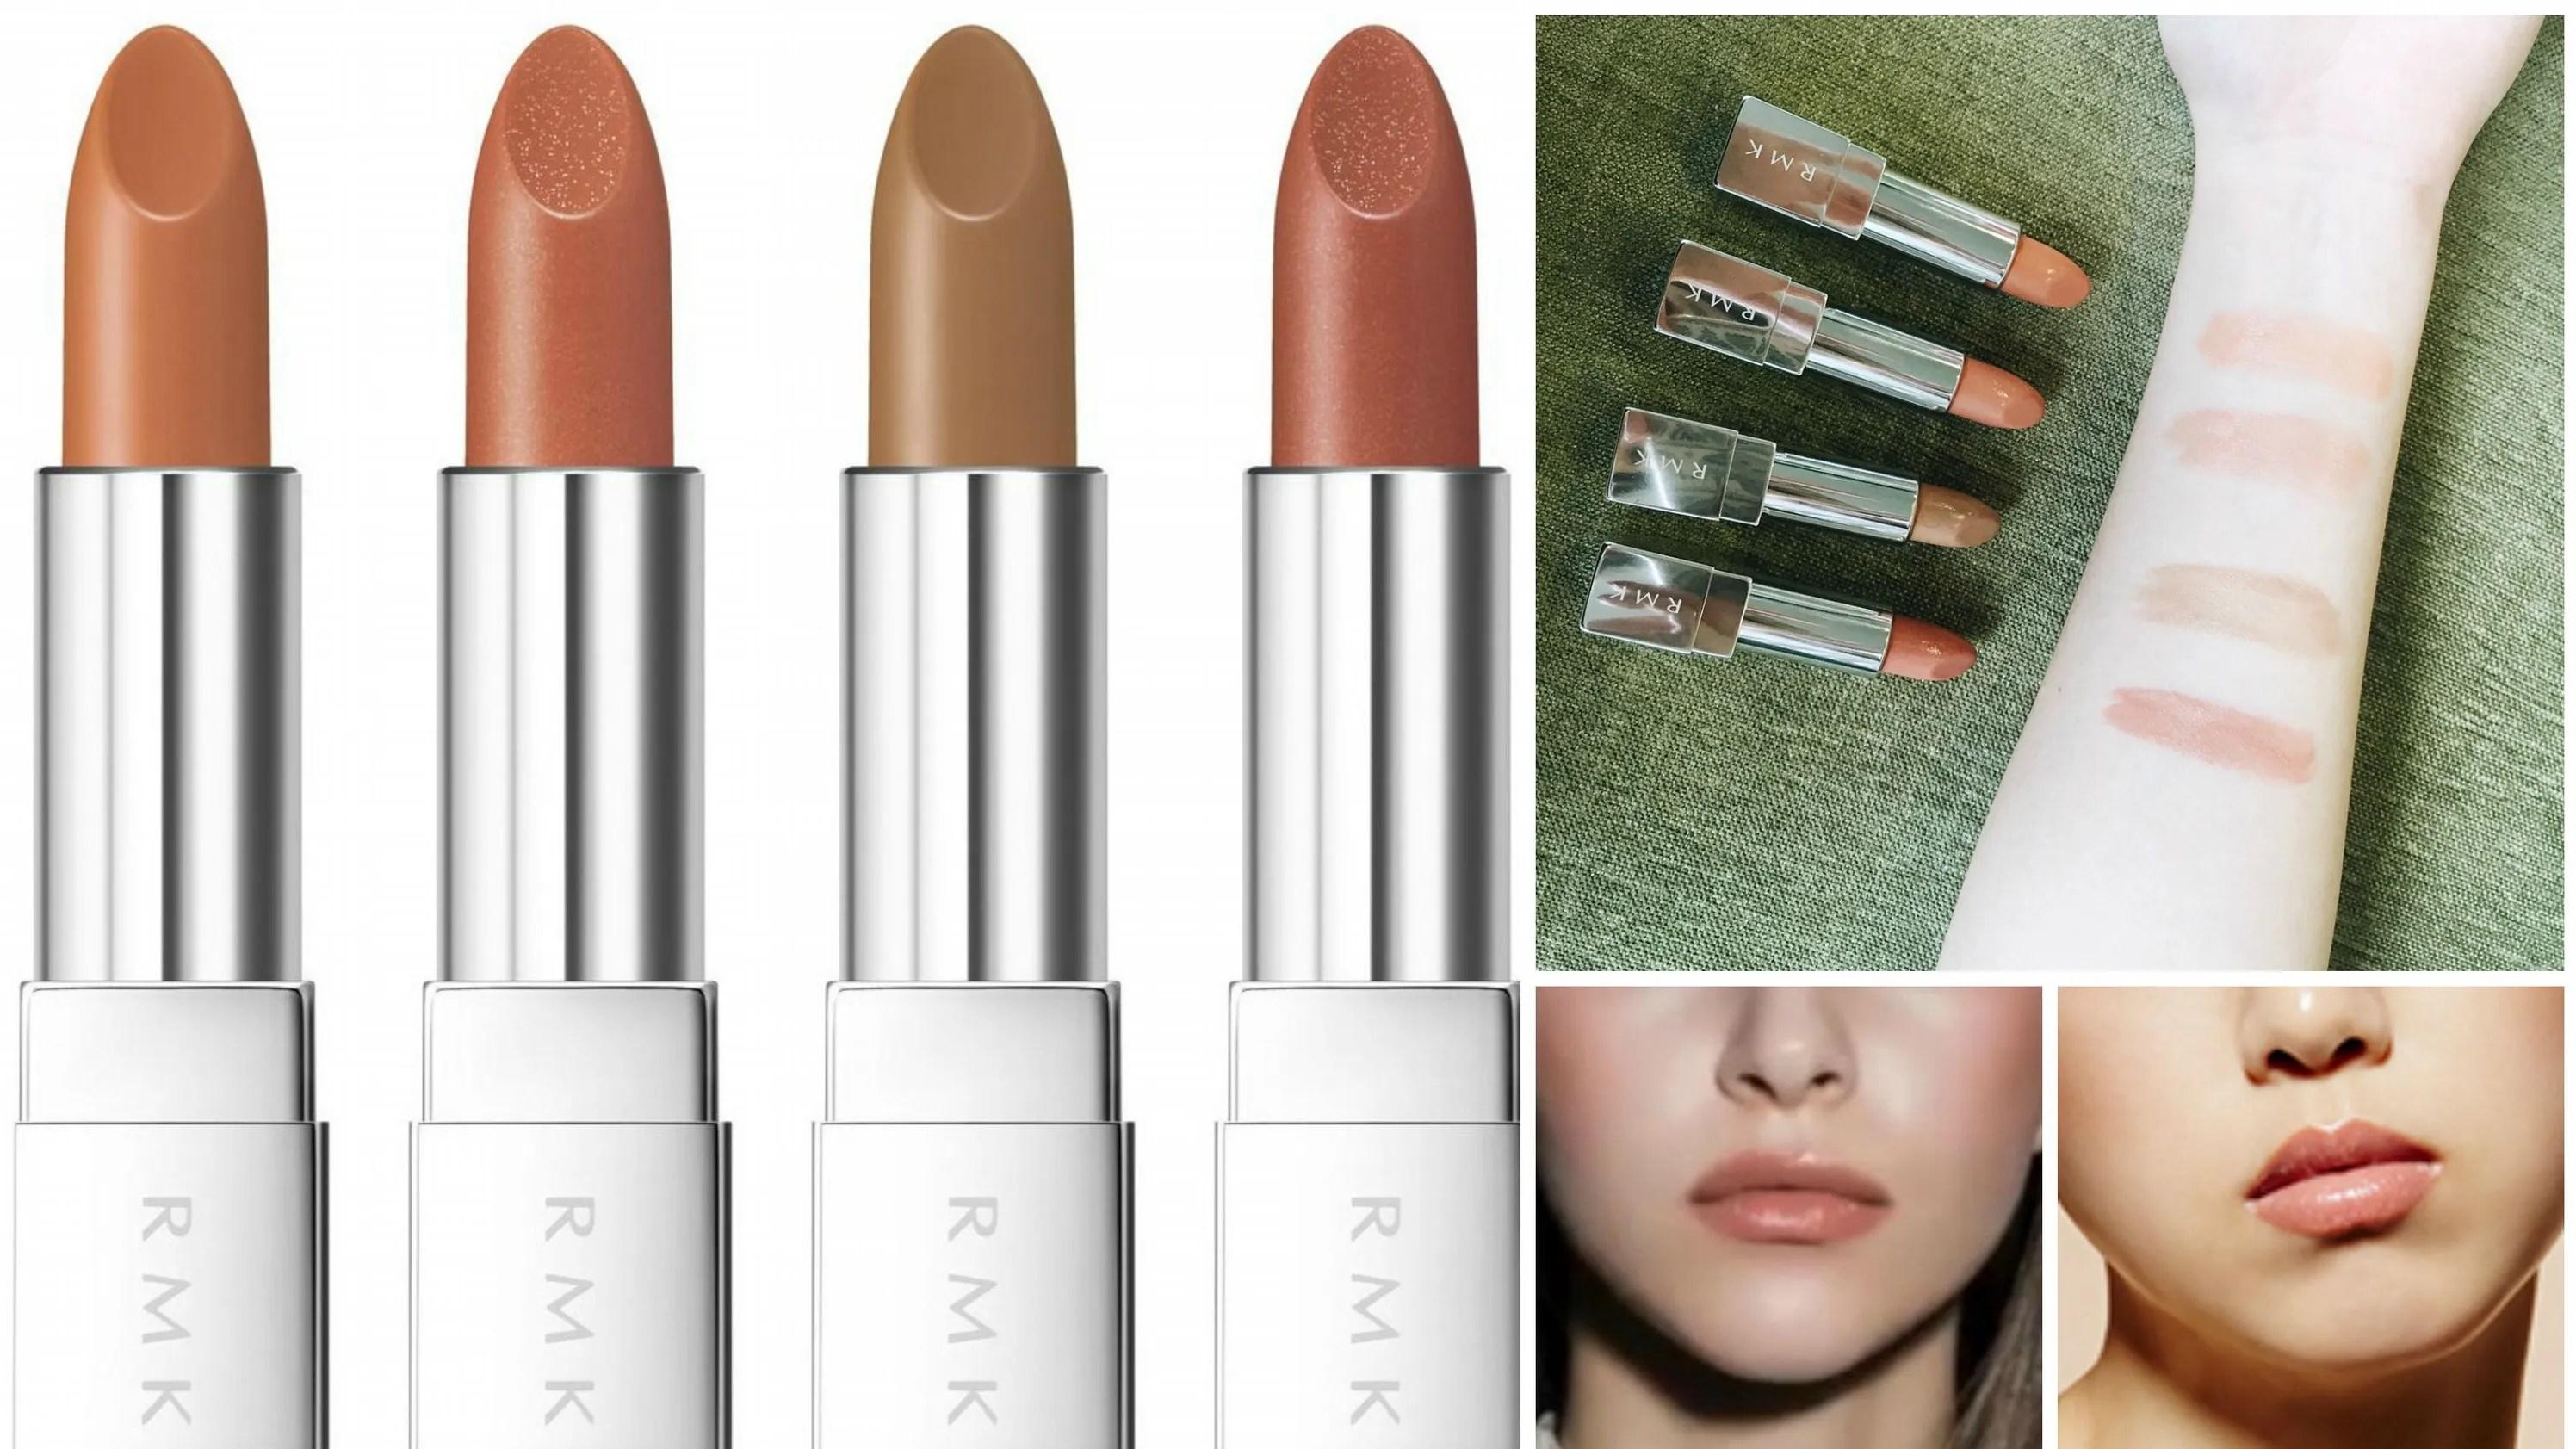 RMK推出自然優雅的「裸棕色調」唇膏,讓女孩無負擔跟上咖啡唇色熱潮!   Vogue Taiwan